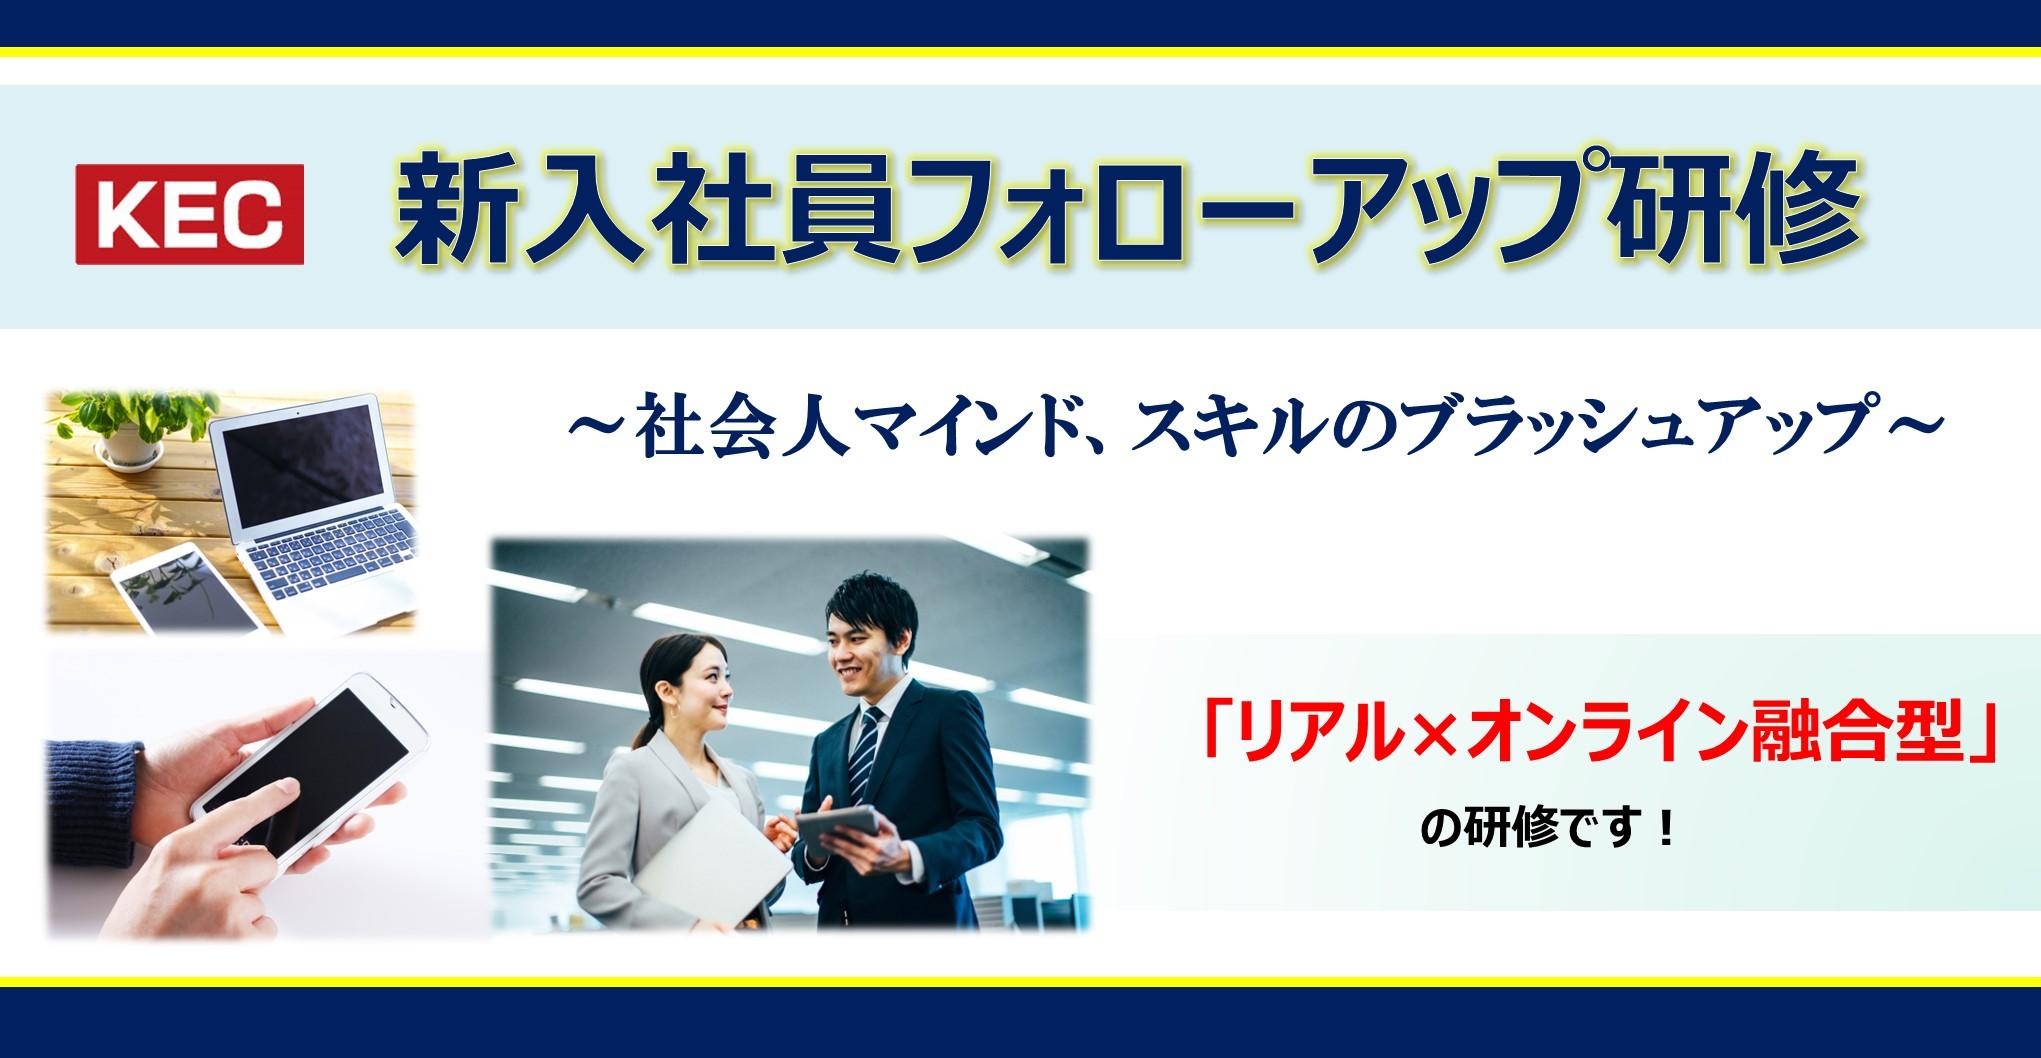 https://www.consul.kec.ne.jp/wp/wp-content/uploads/2020/05/540-280-follow-up.jpg